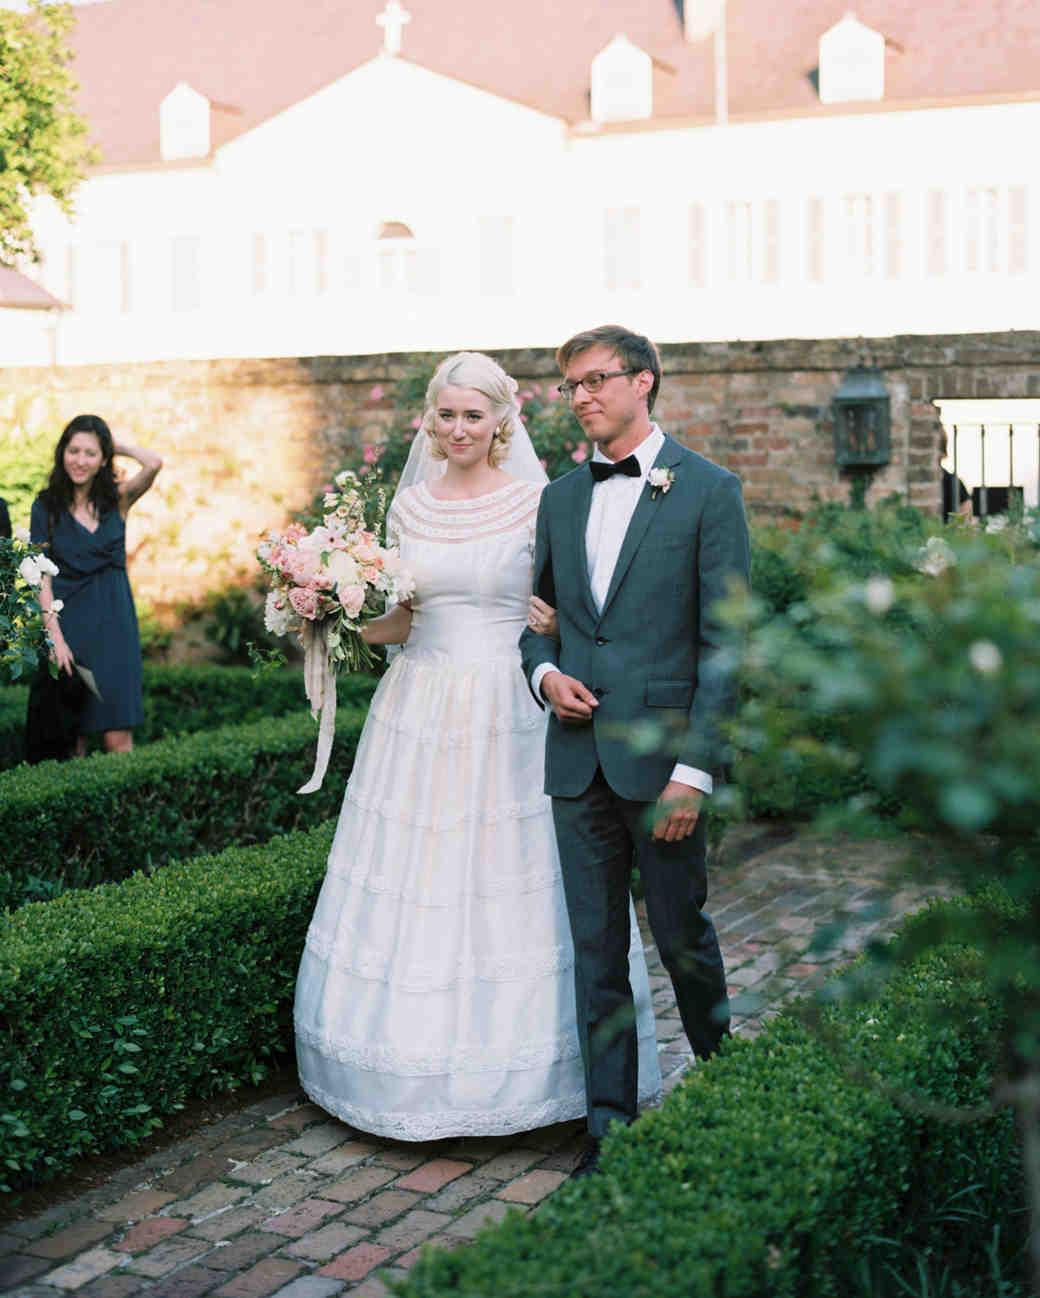 jessica-graham-wedding-processional-0086-s112171-0915.jpg